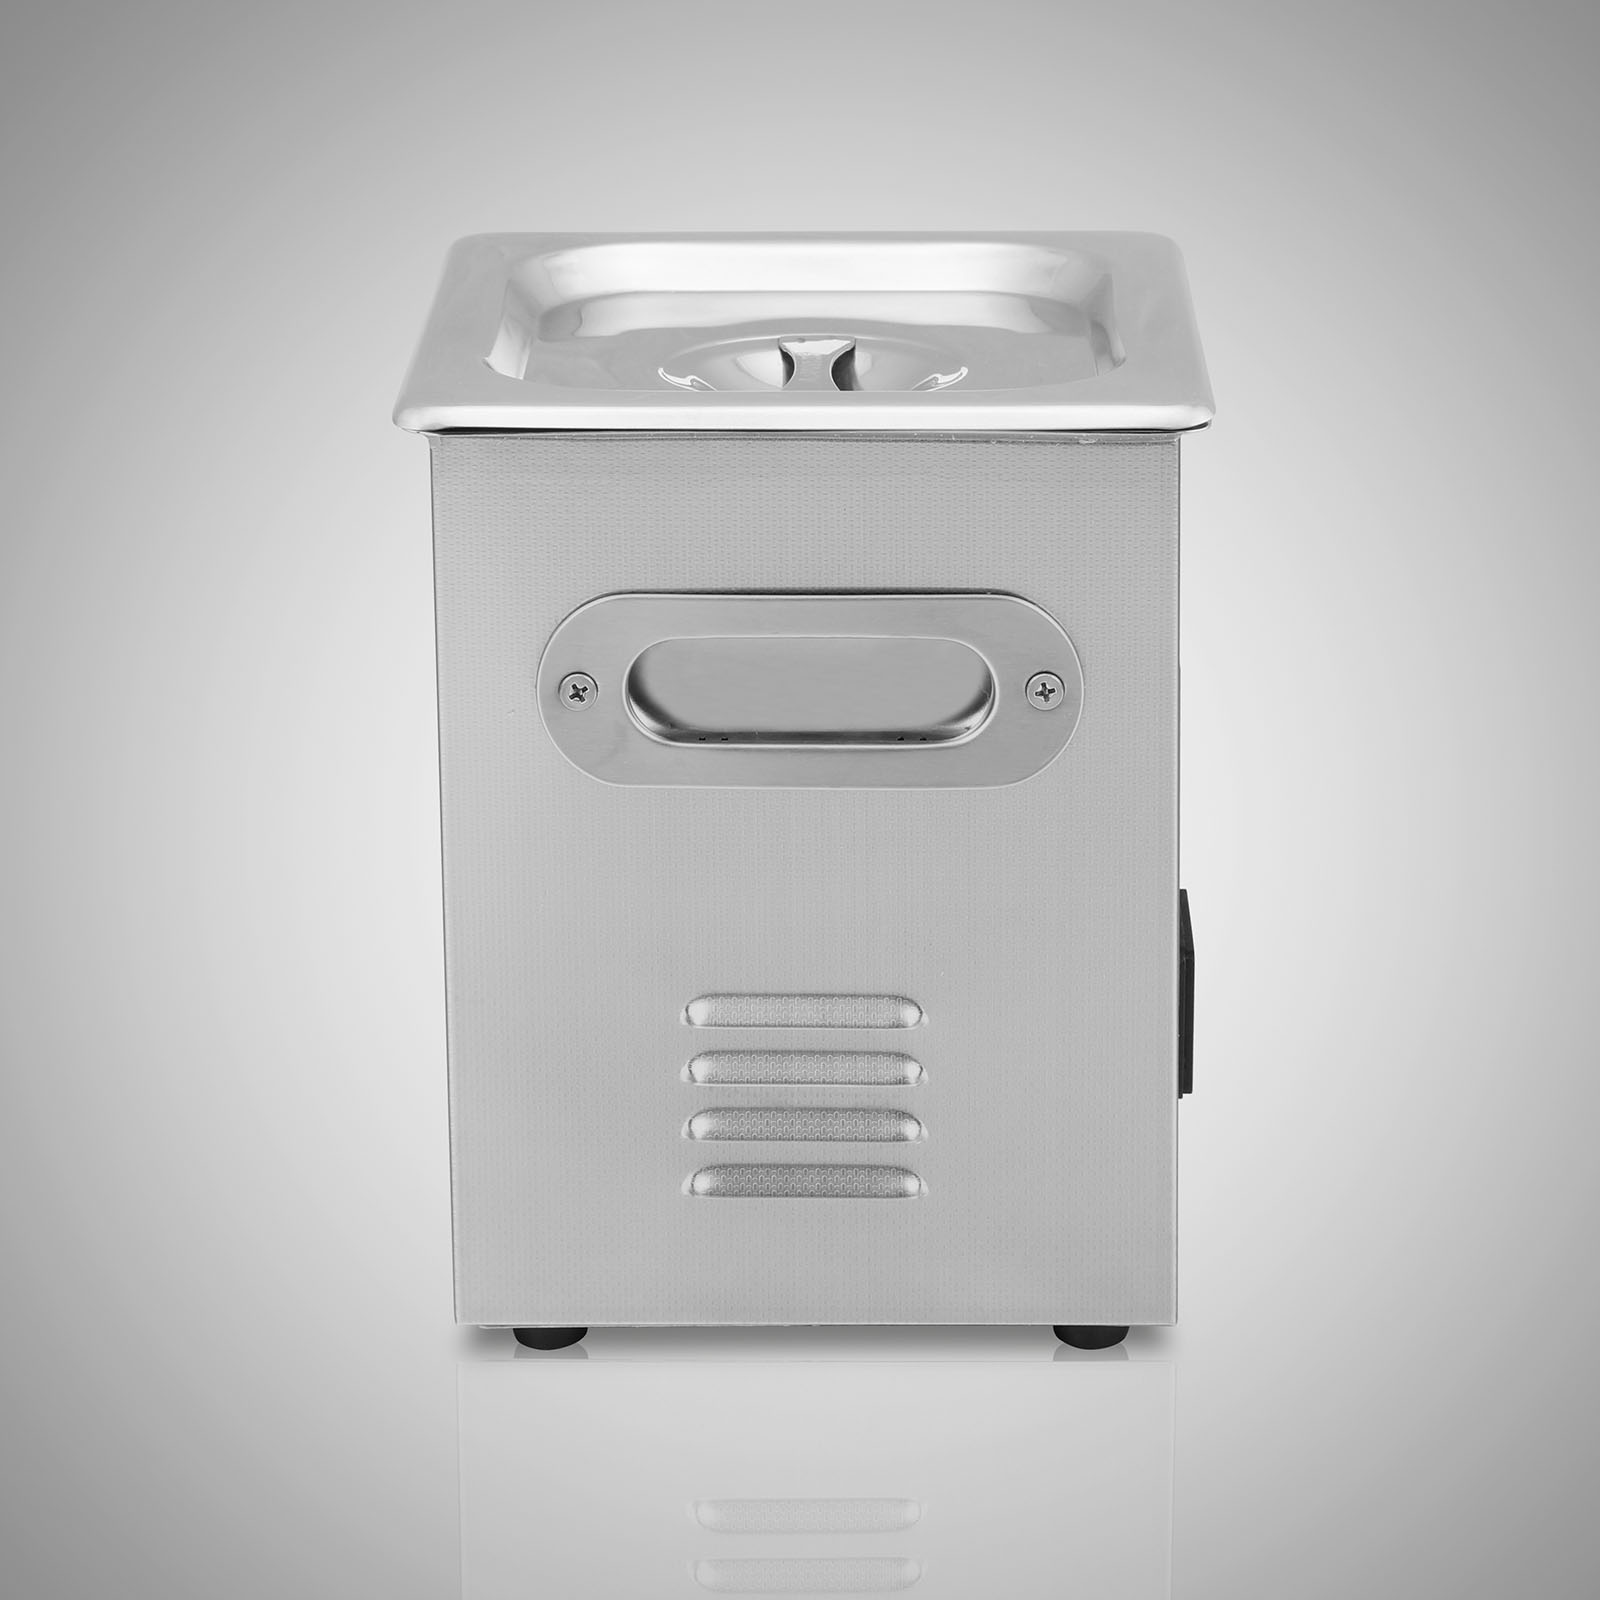 Vaschetta-Vasca-Ultrasuoni-Lavatrice-Pulitore-Ad-Ultrasuoni miniatura 36